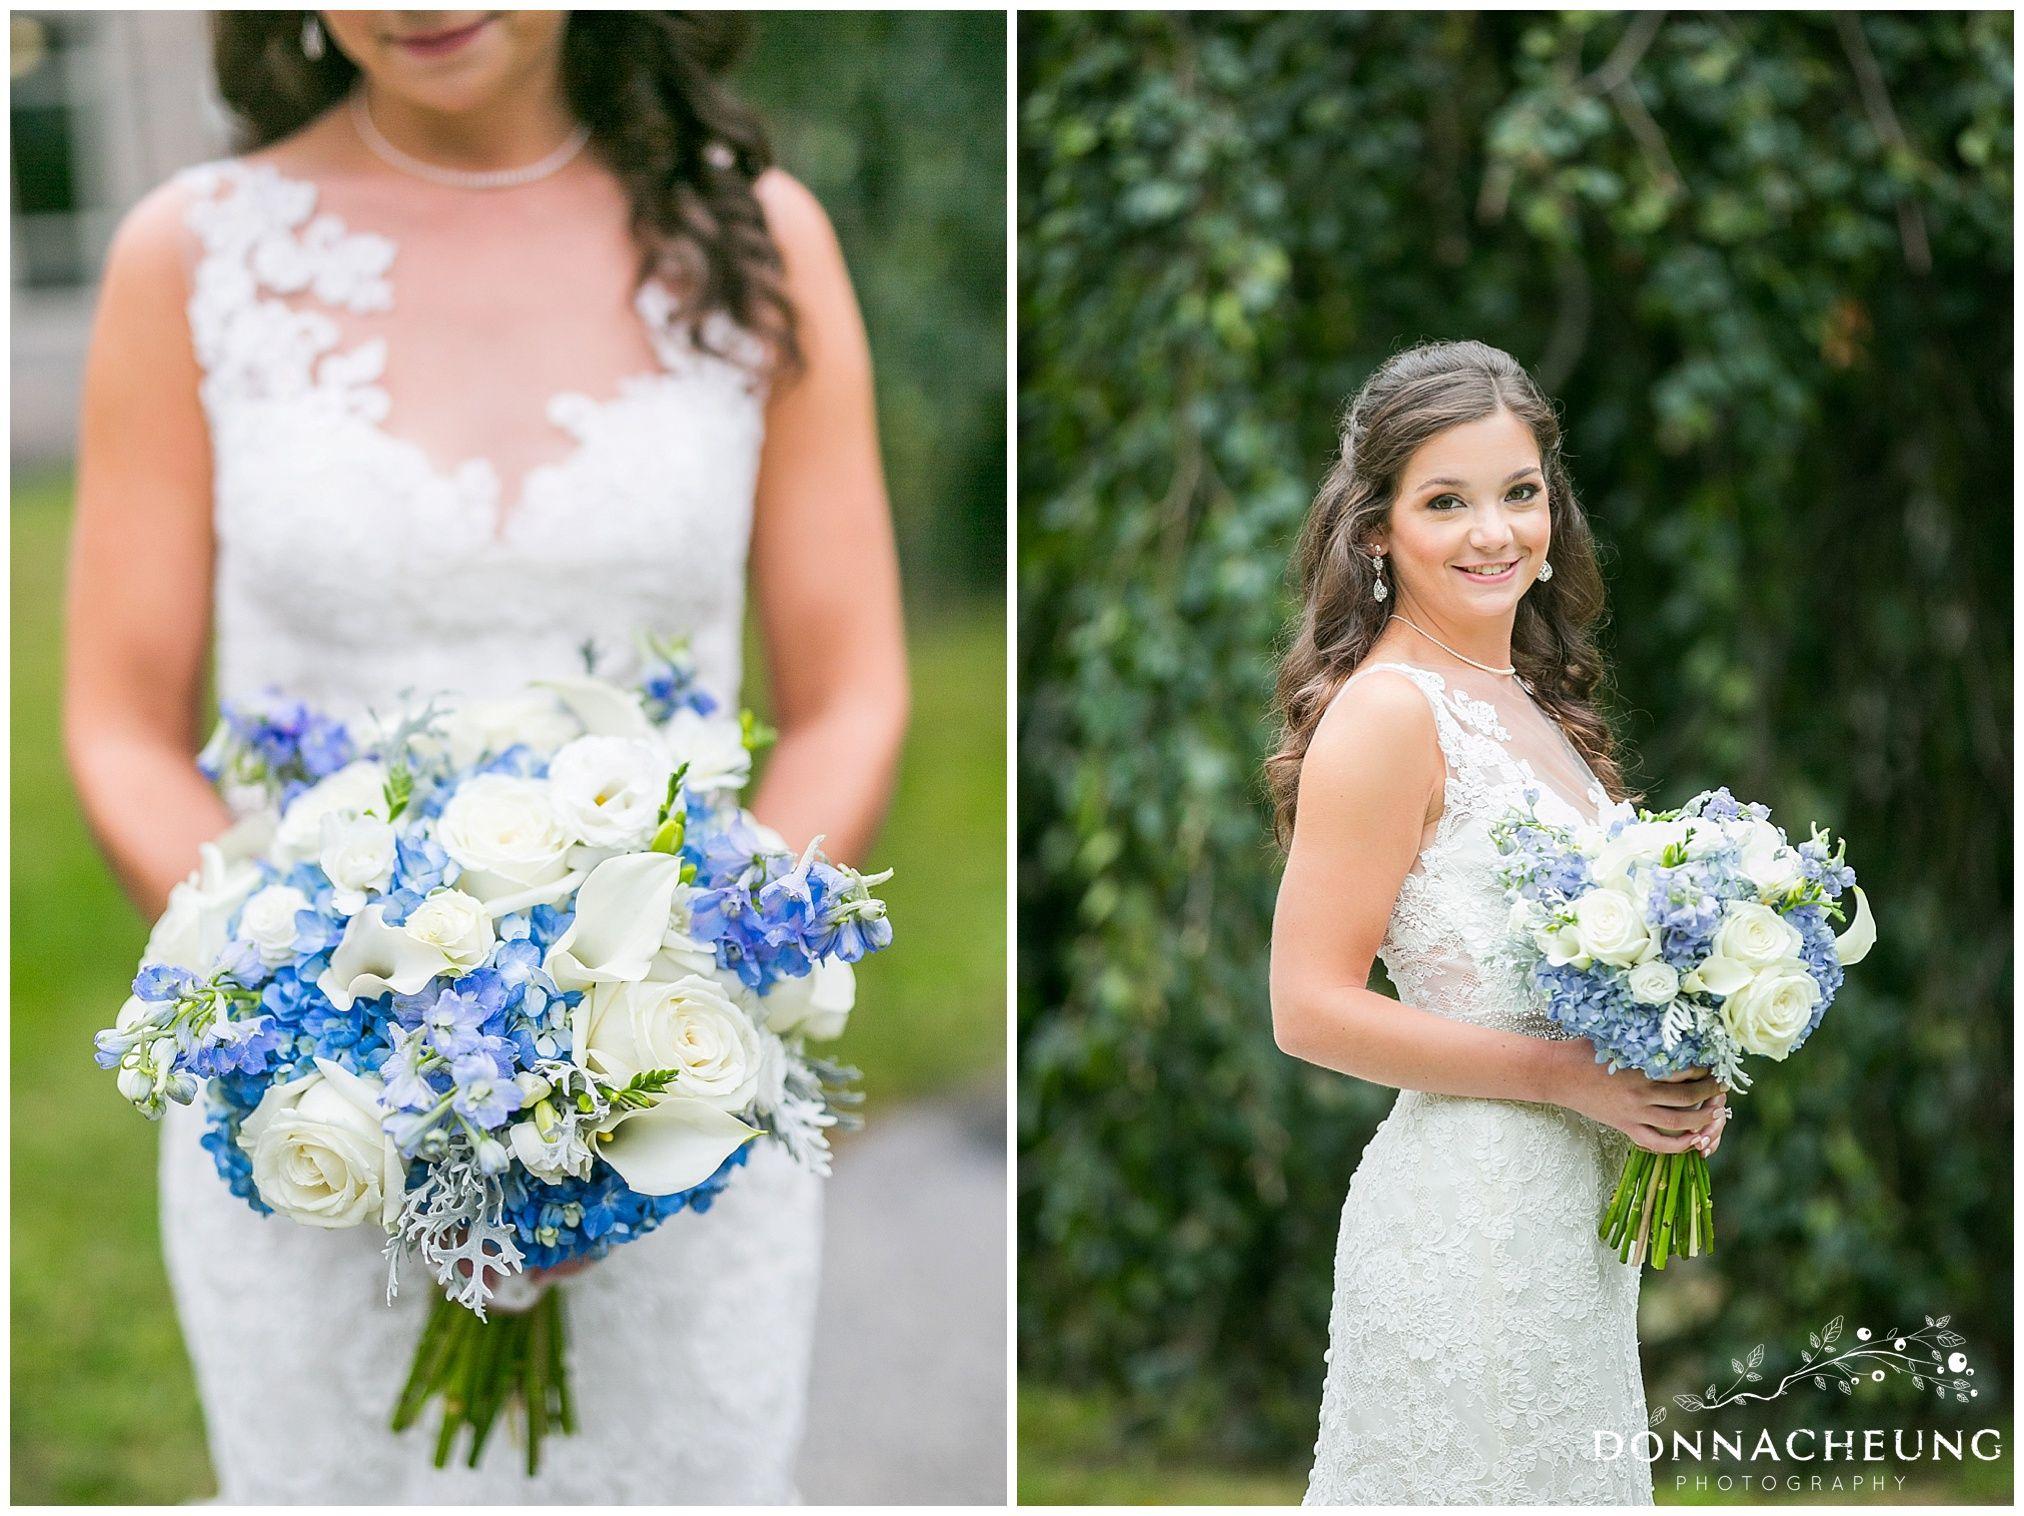 Kelly + Steve: Doral Arrowood – Rye, NY Wedding | Donna Cheung Photography